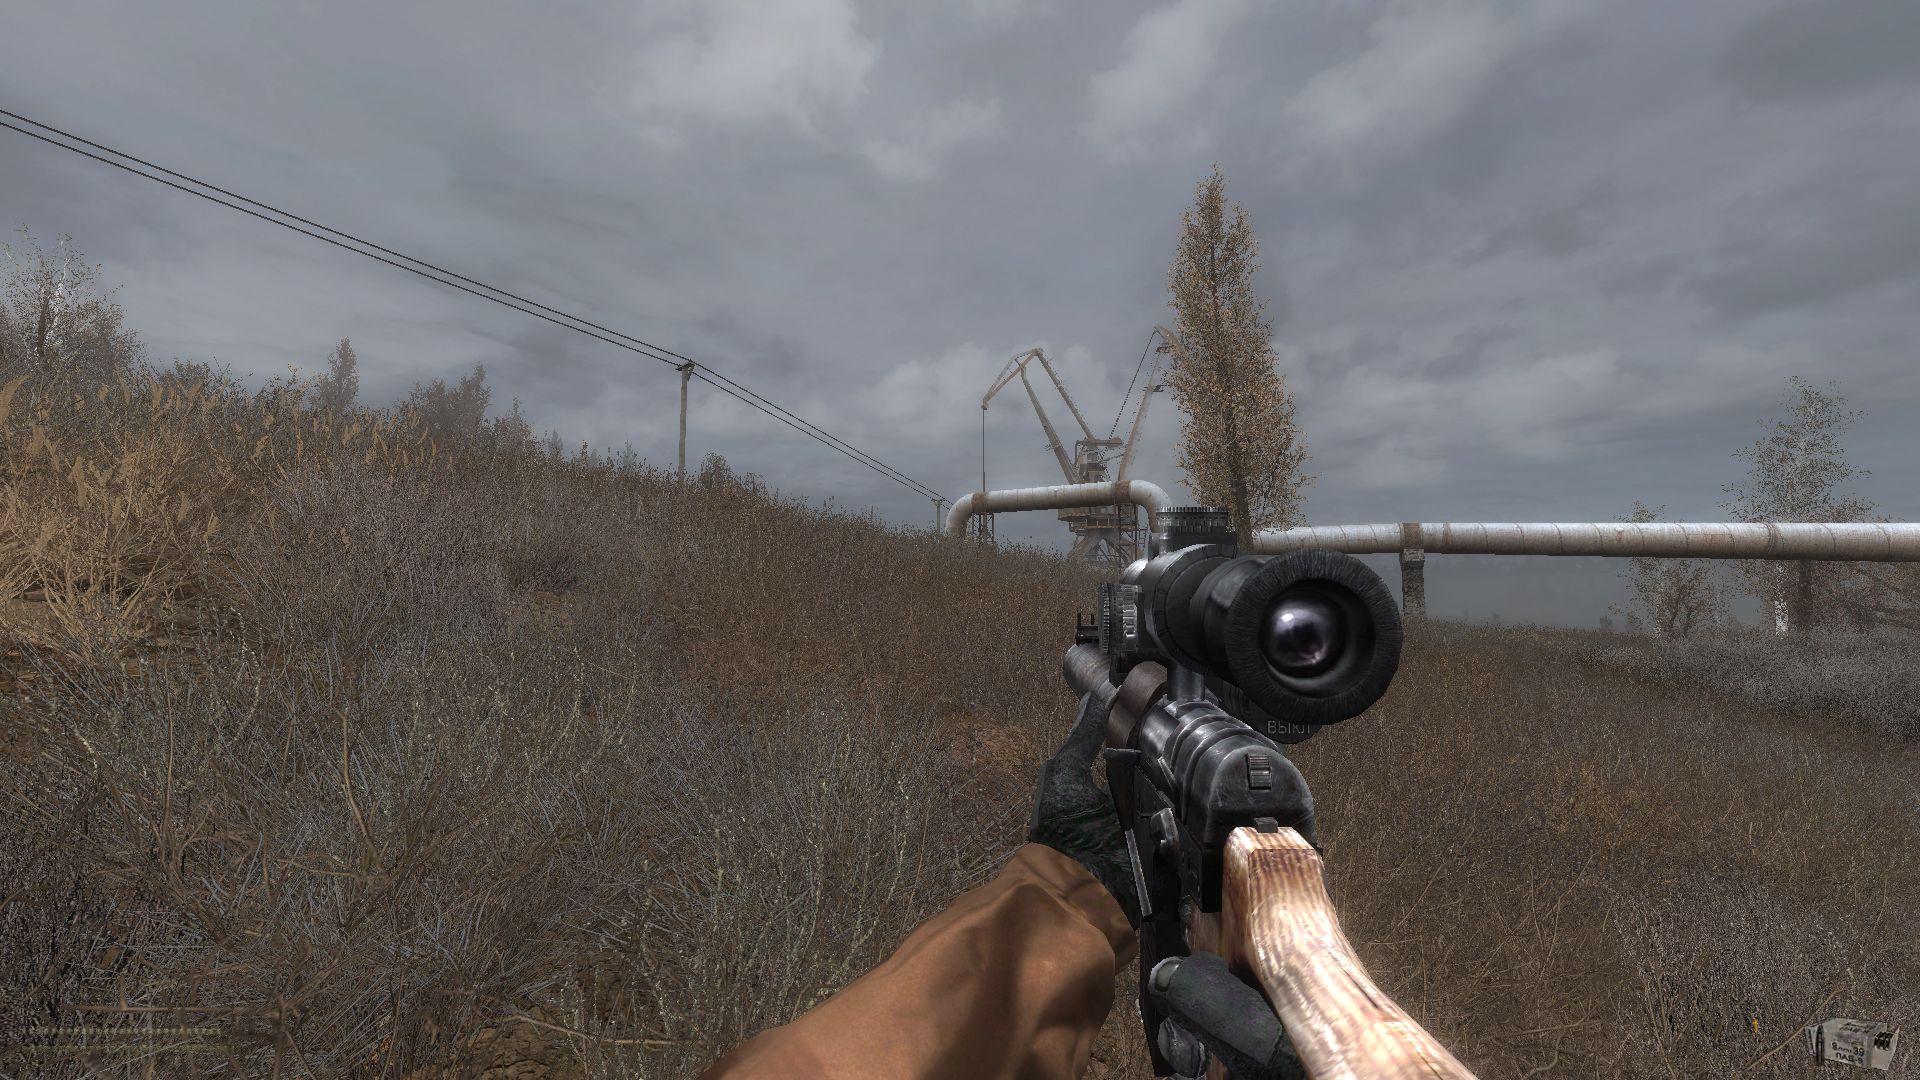 00023.Jpg - S.T.A.L.K.E.R.: Call of Pripyat